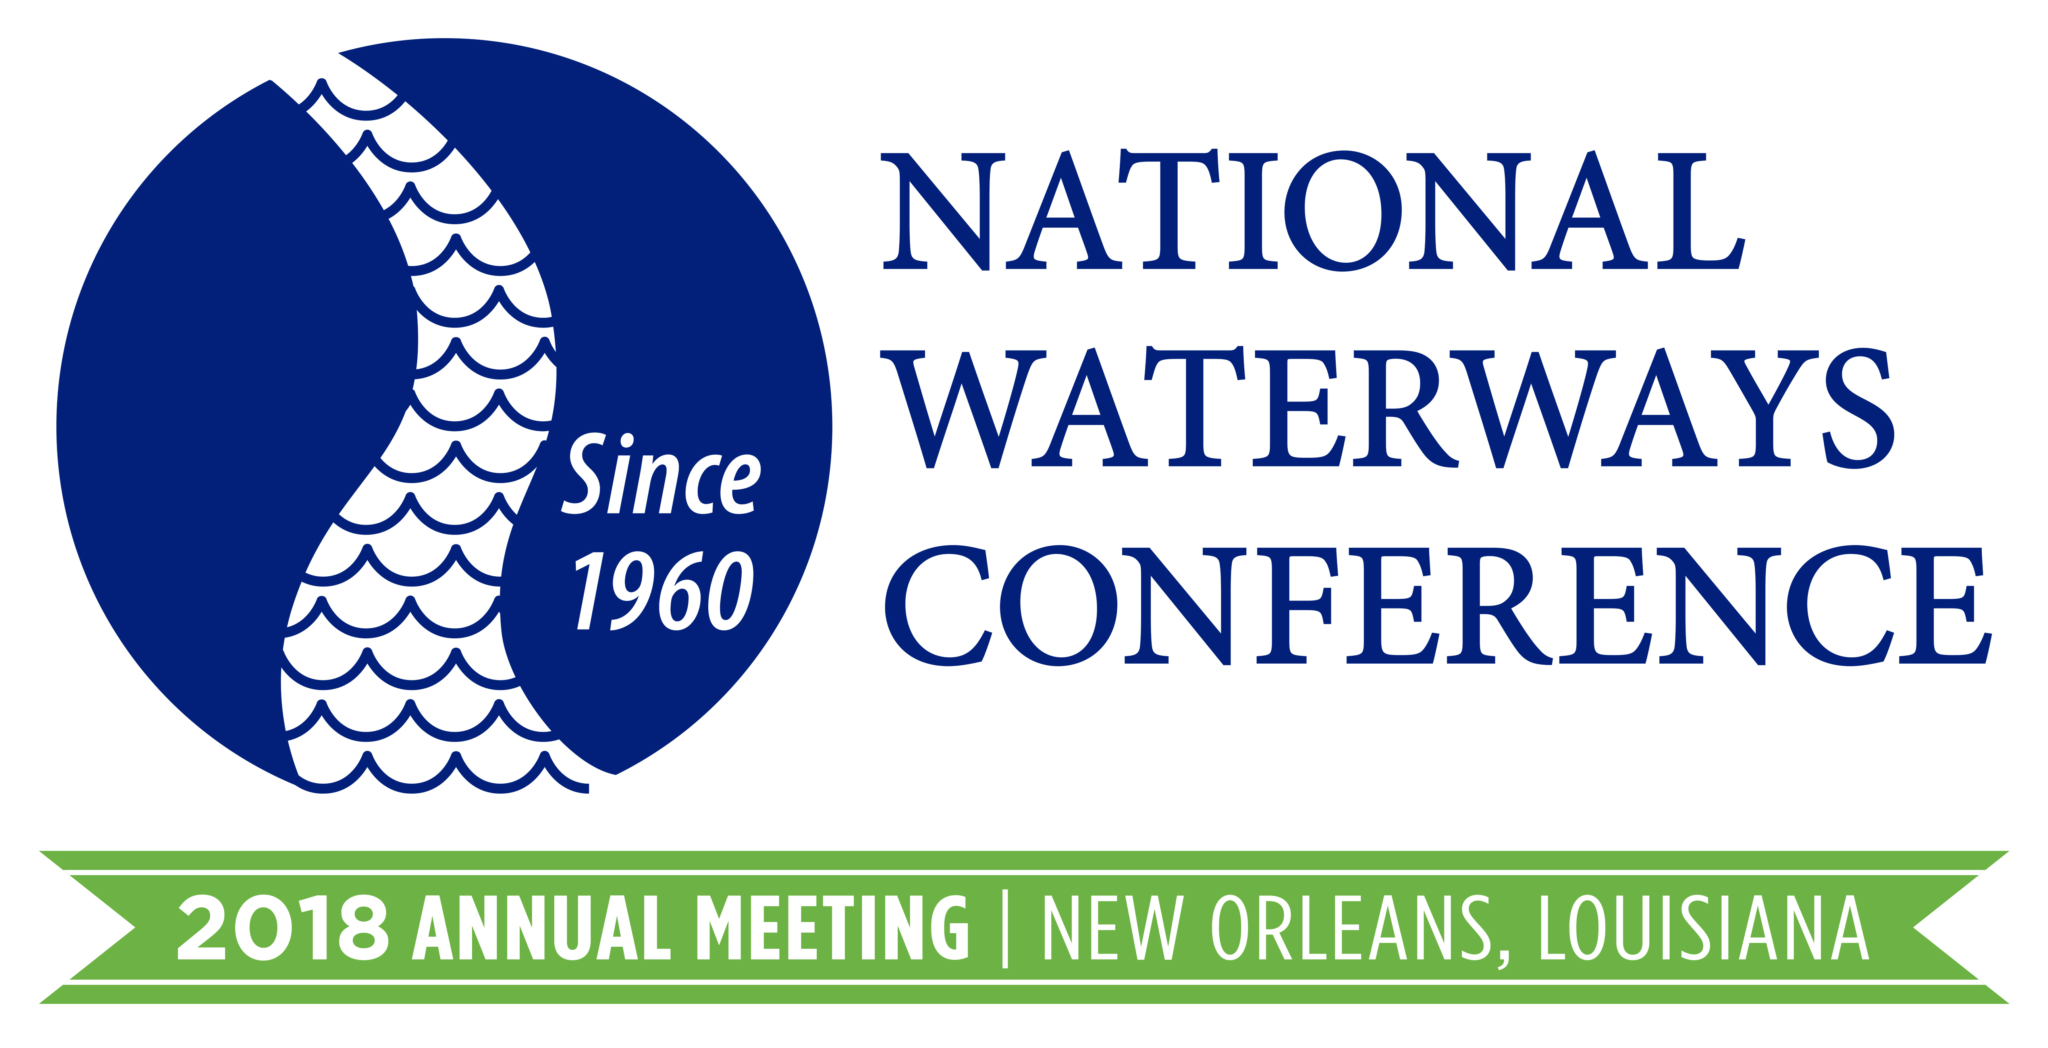 08 15 18 Nwc Media Alert Logo Crop